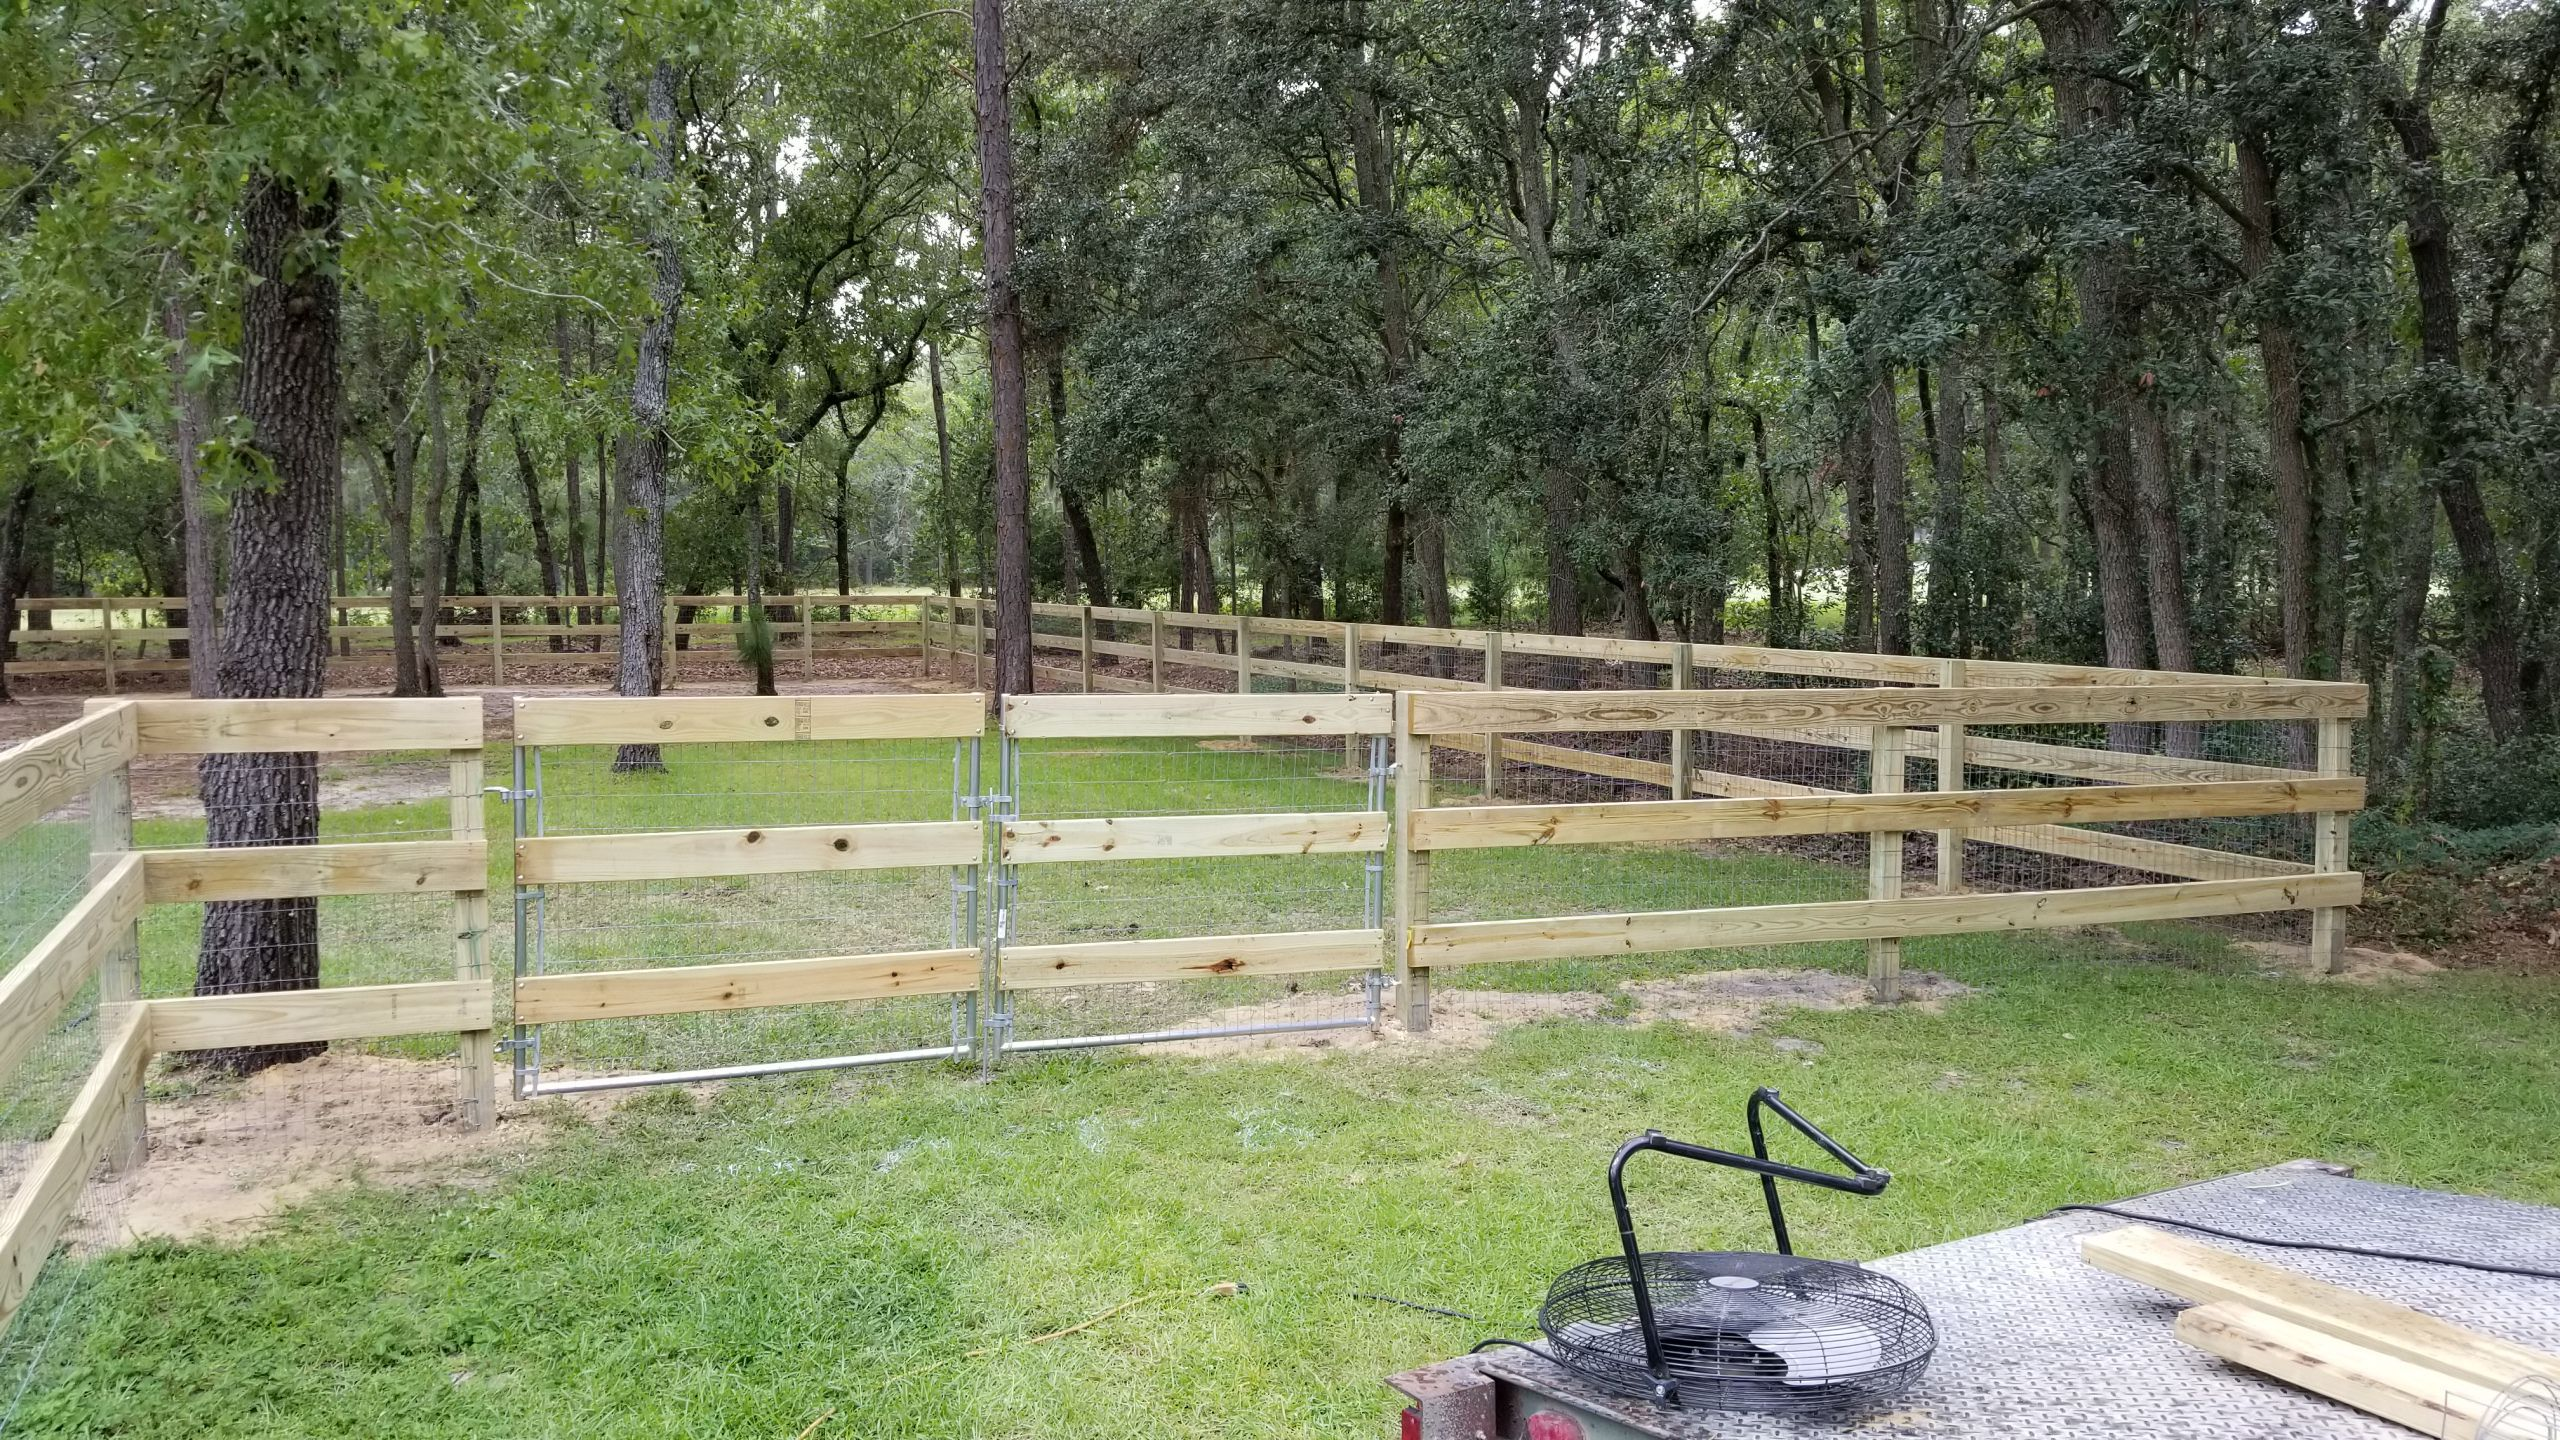 2x6 three rail farm fence with wire mesh. Reinforced steel ...